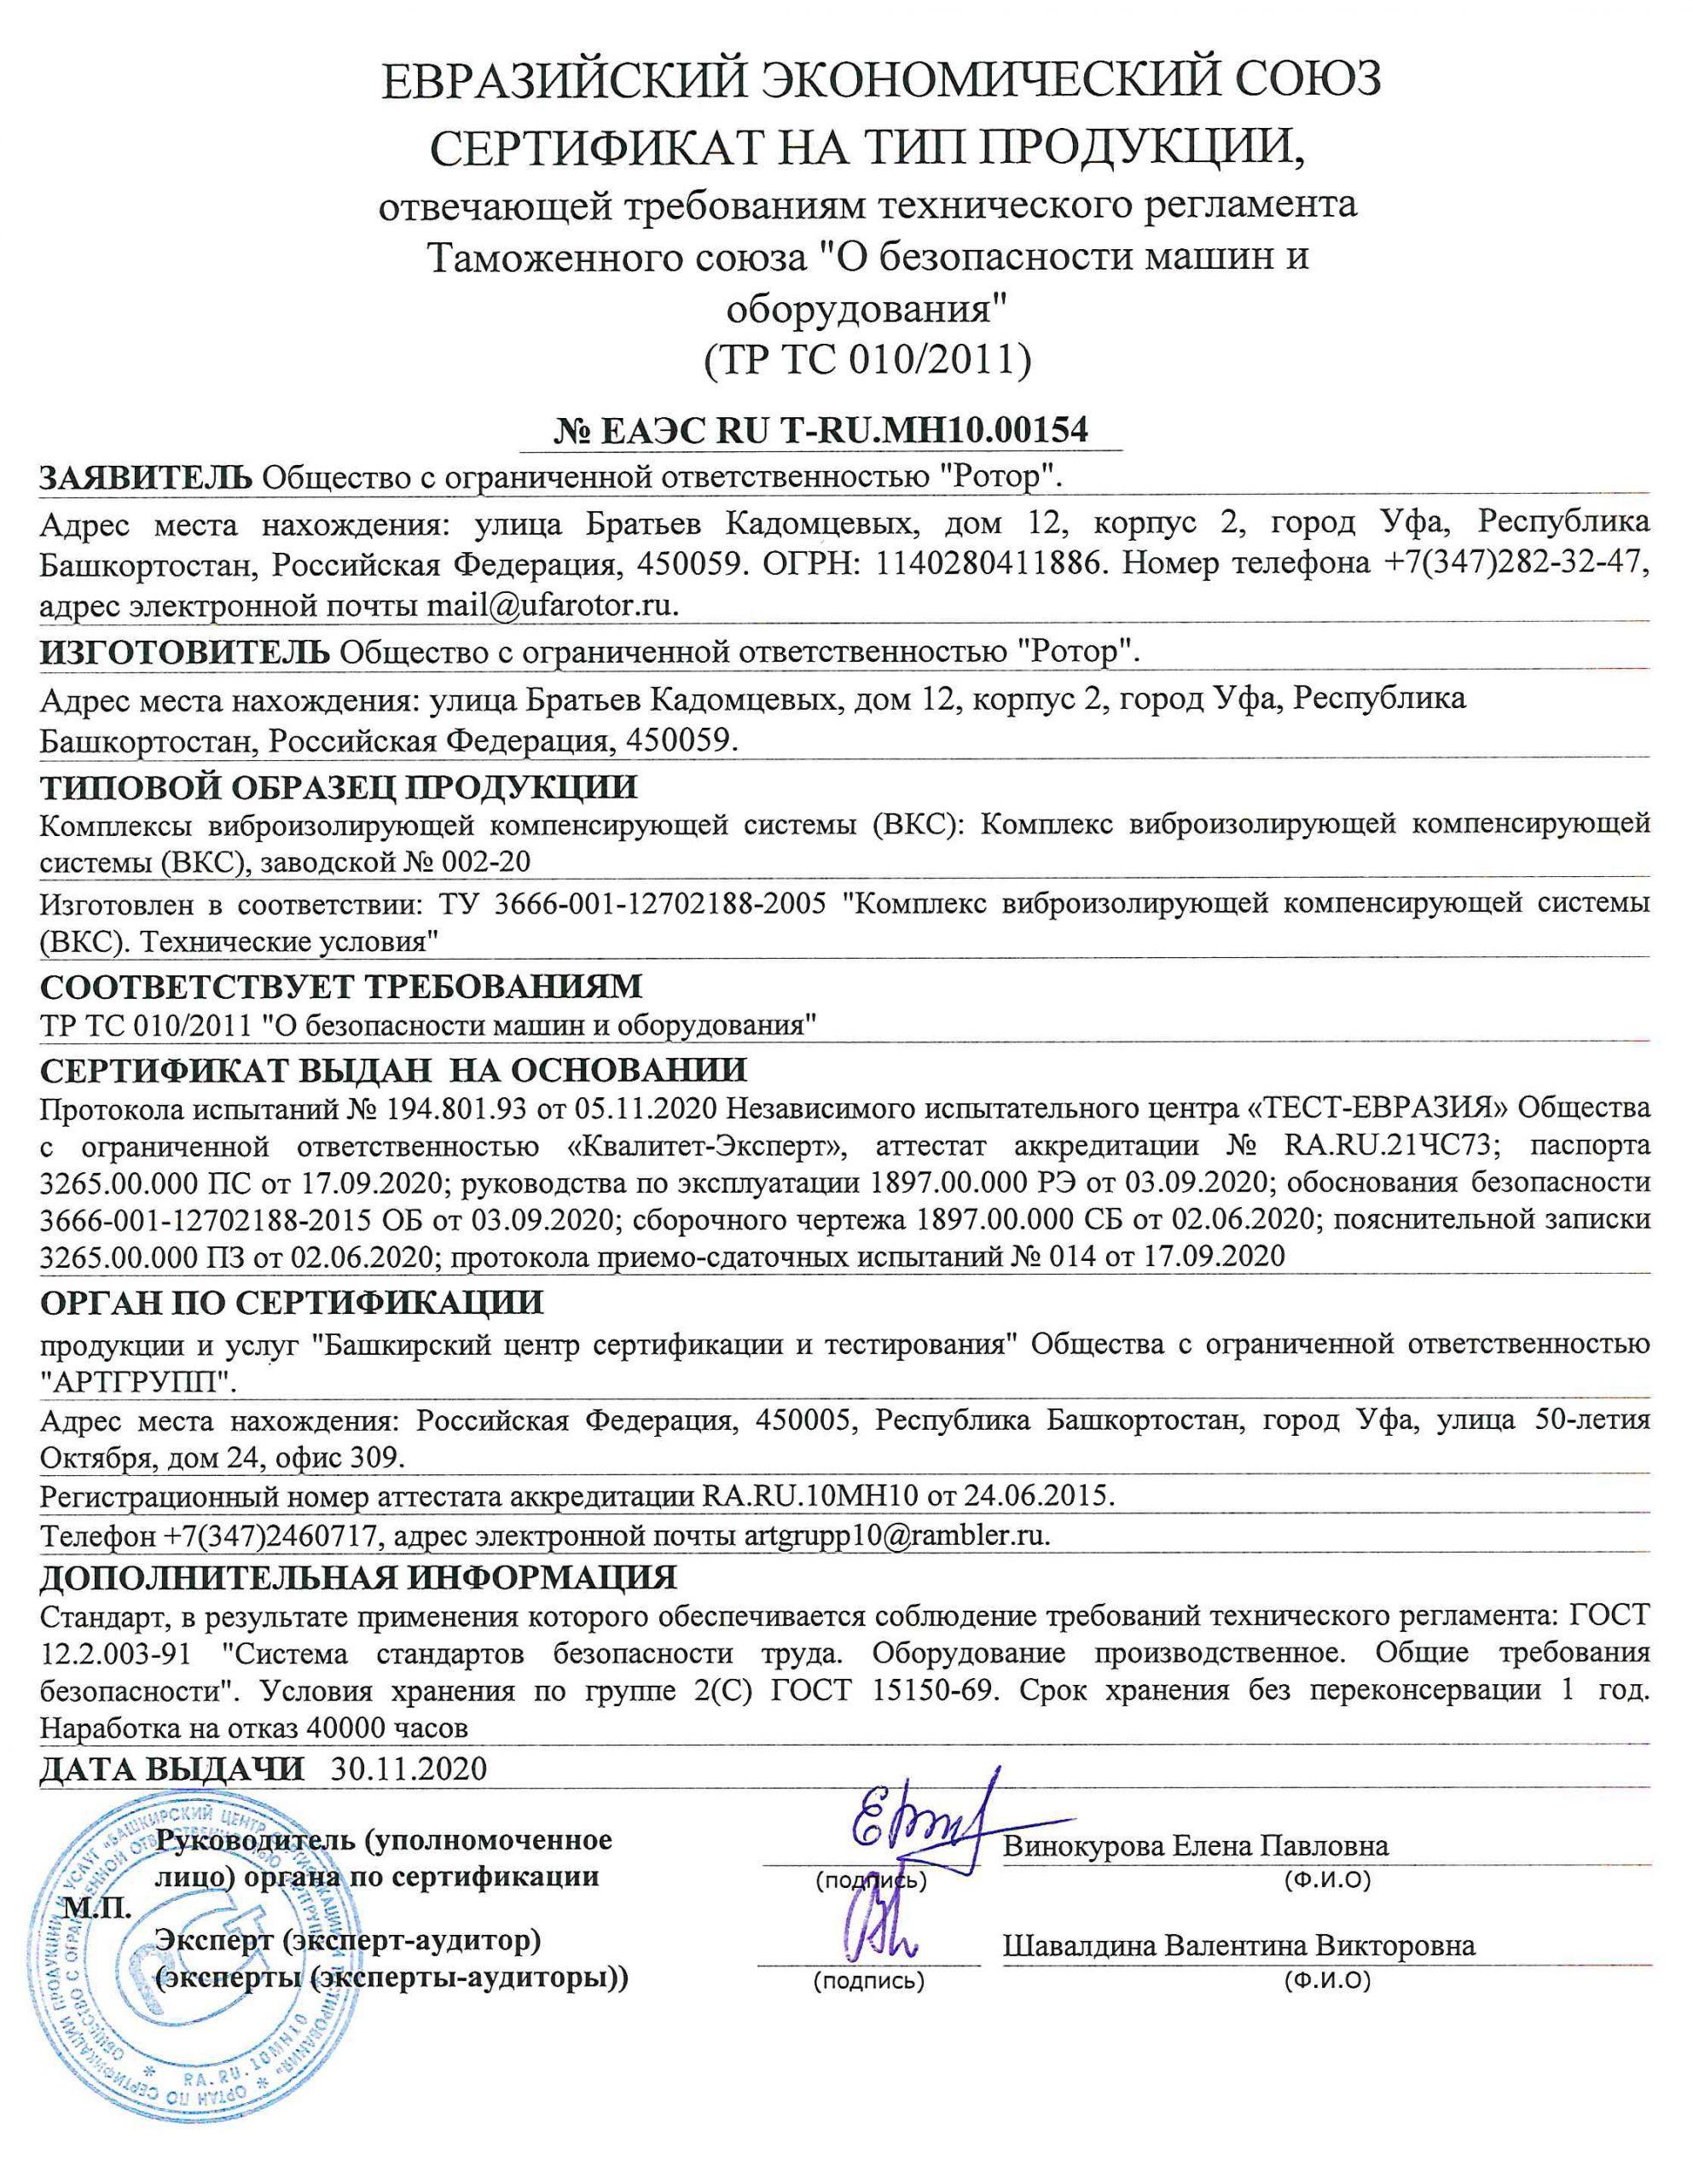 Сертификат на тип продукции